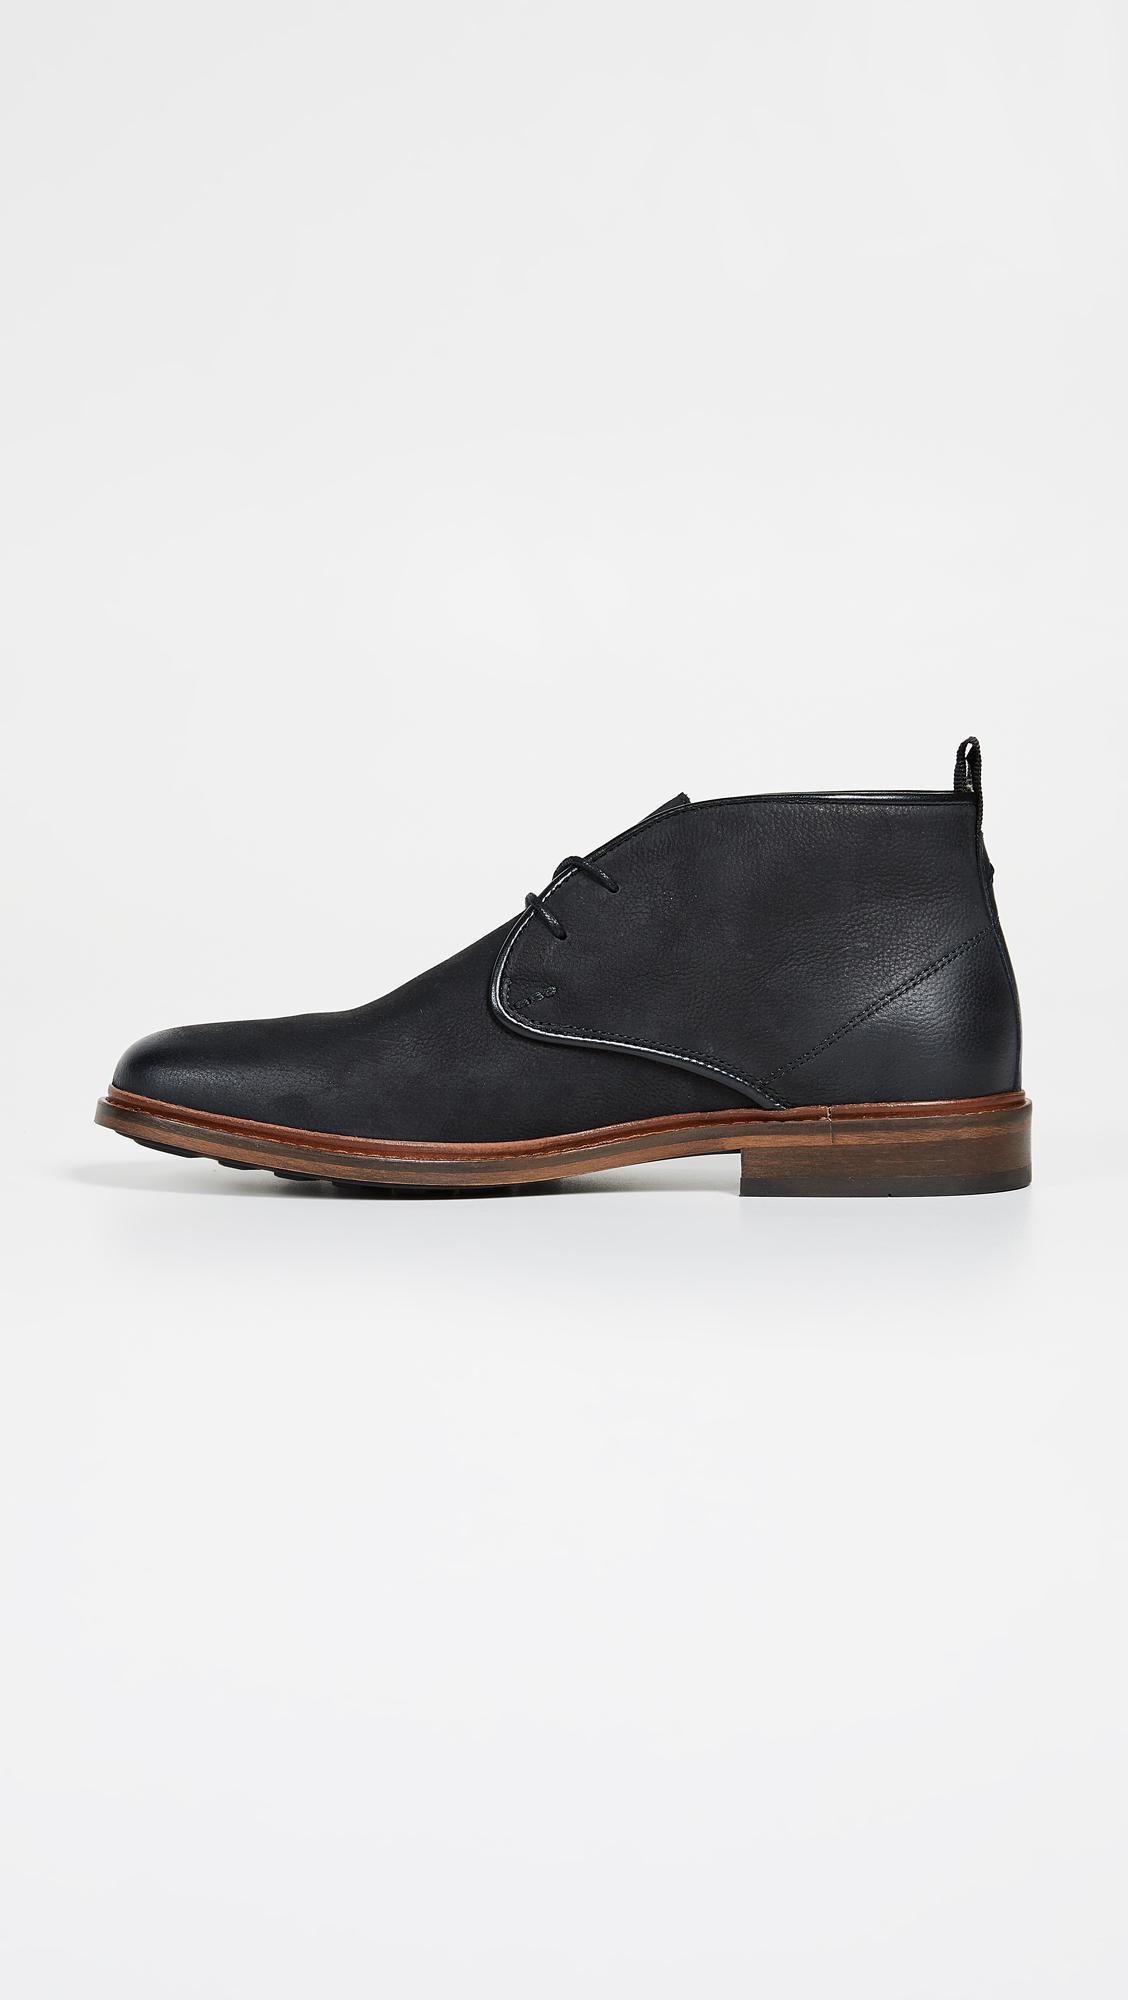 56988cbfe60 Men's Black Dalton Leather Chukka Boots